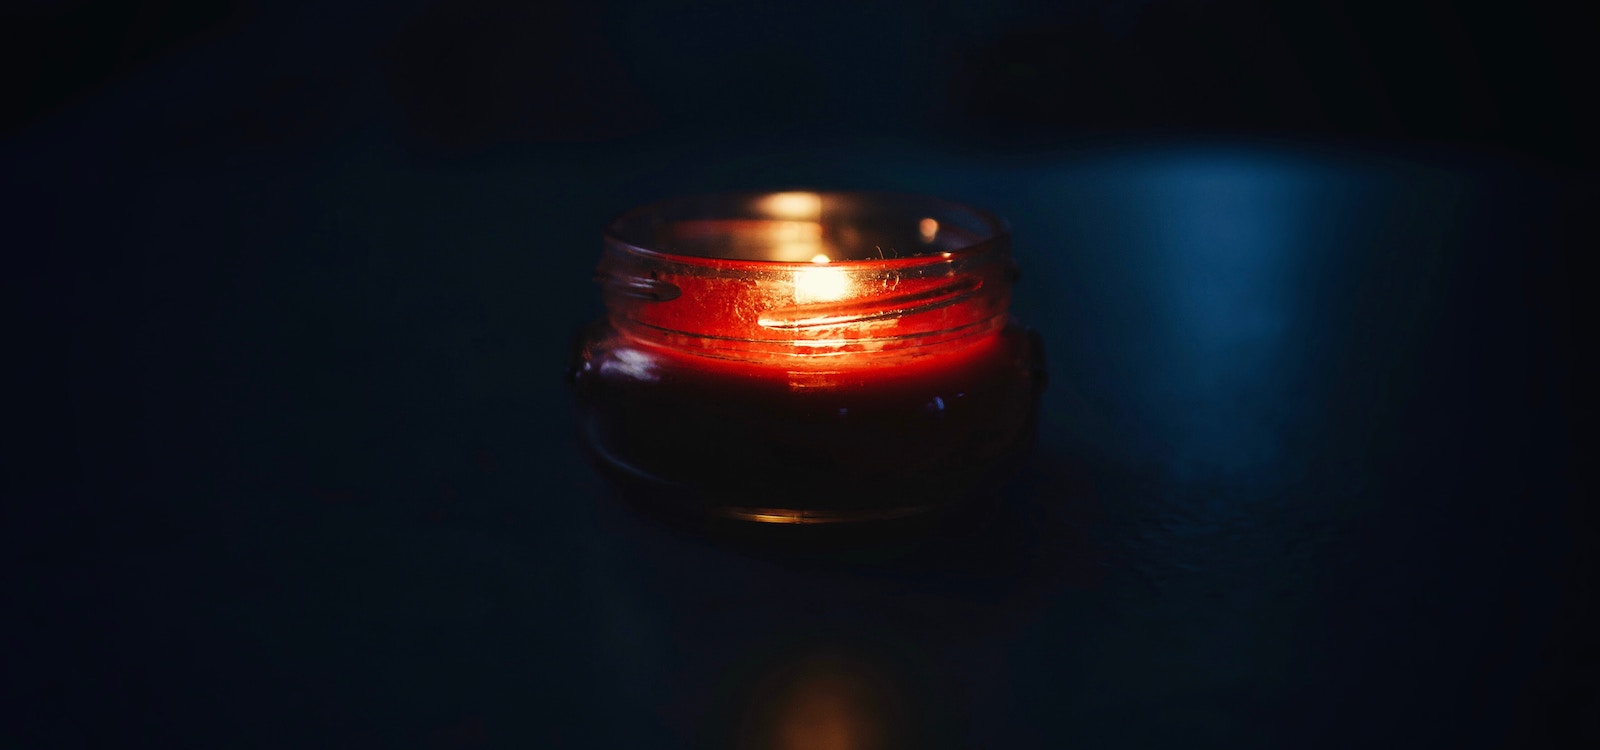 Beautiful candle in the dark